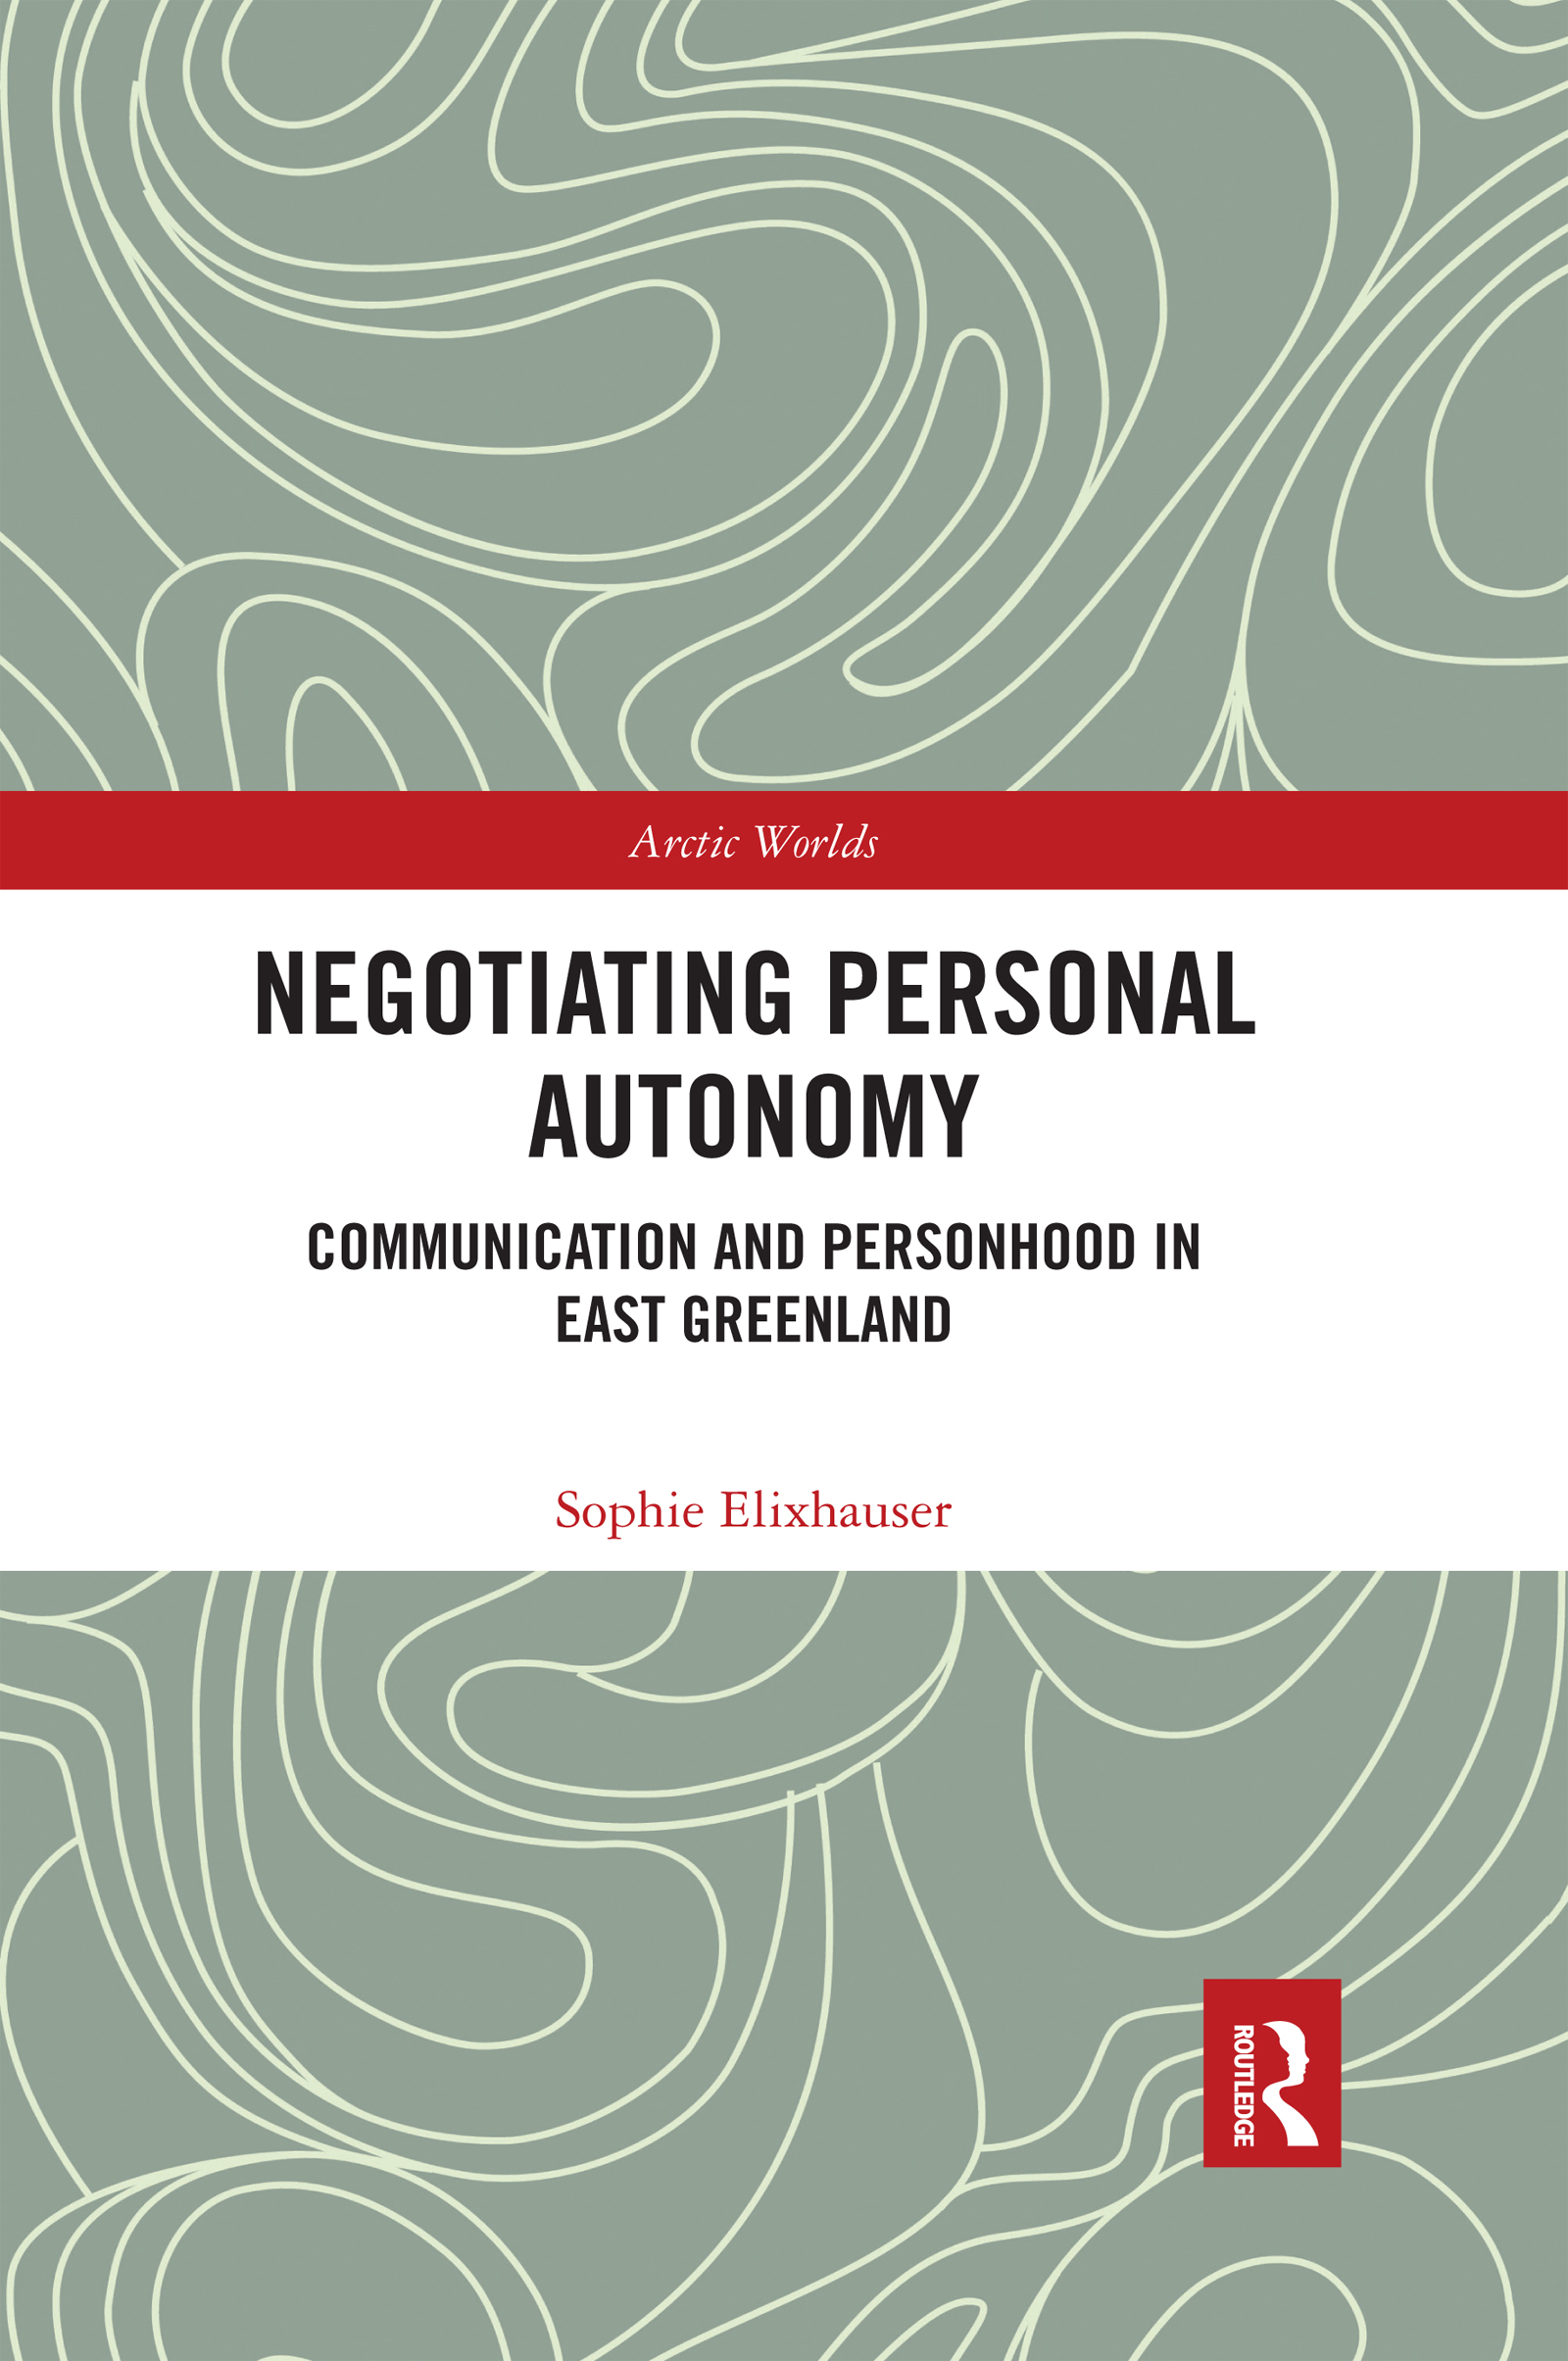 Negotiating Personal Autonomy